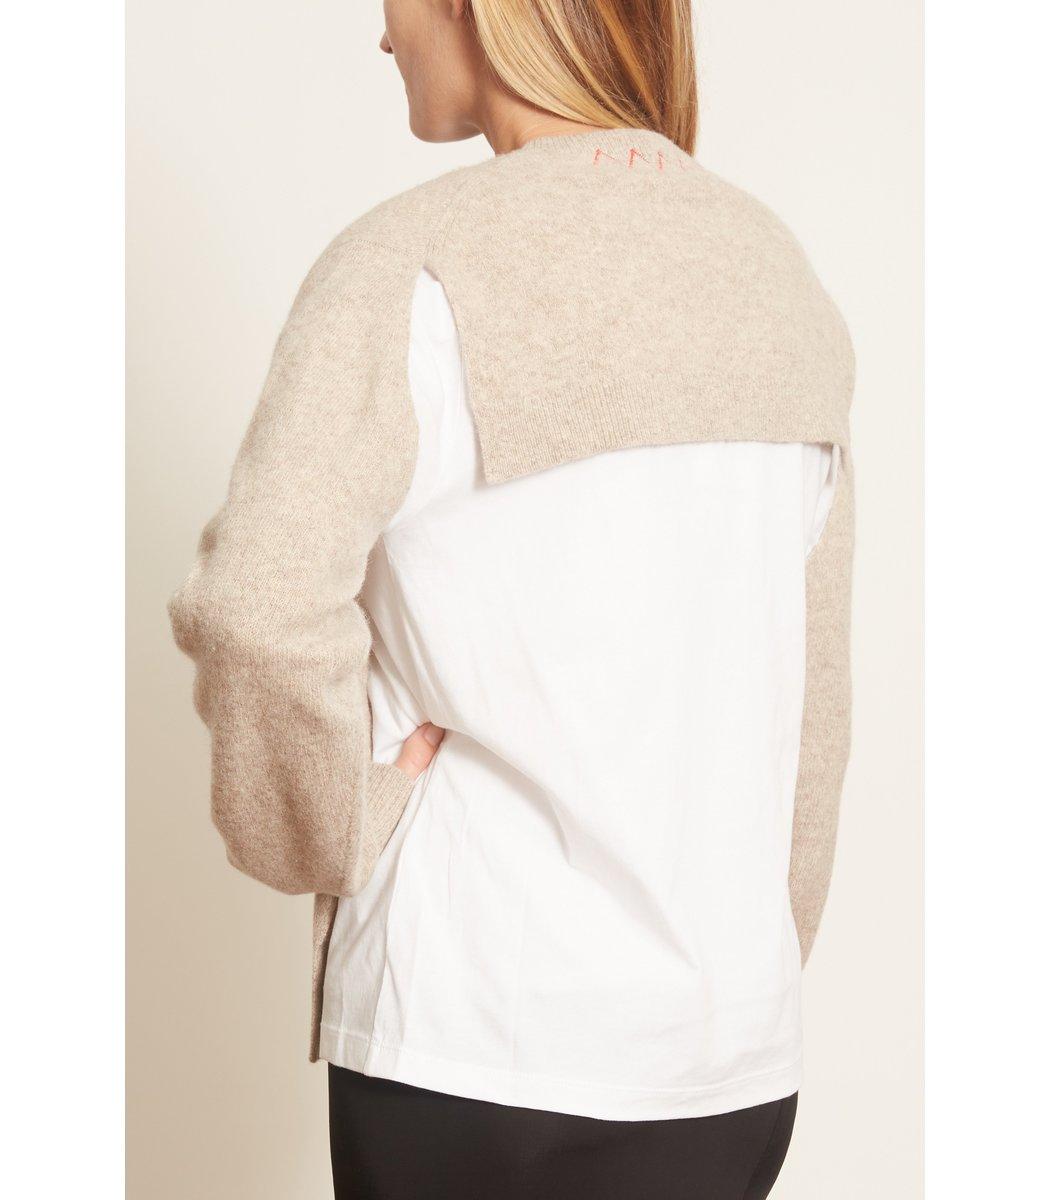 TIBI Downs Lana Layered T-Shirt Sweater in Oatmeal Multi